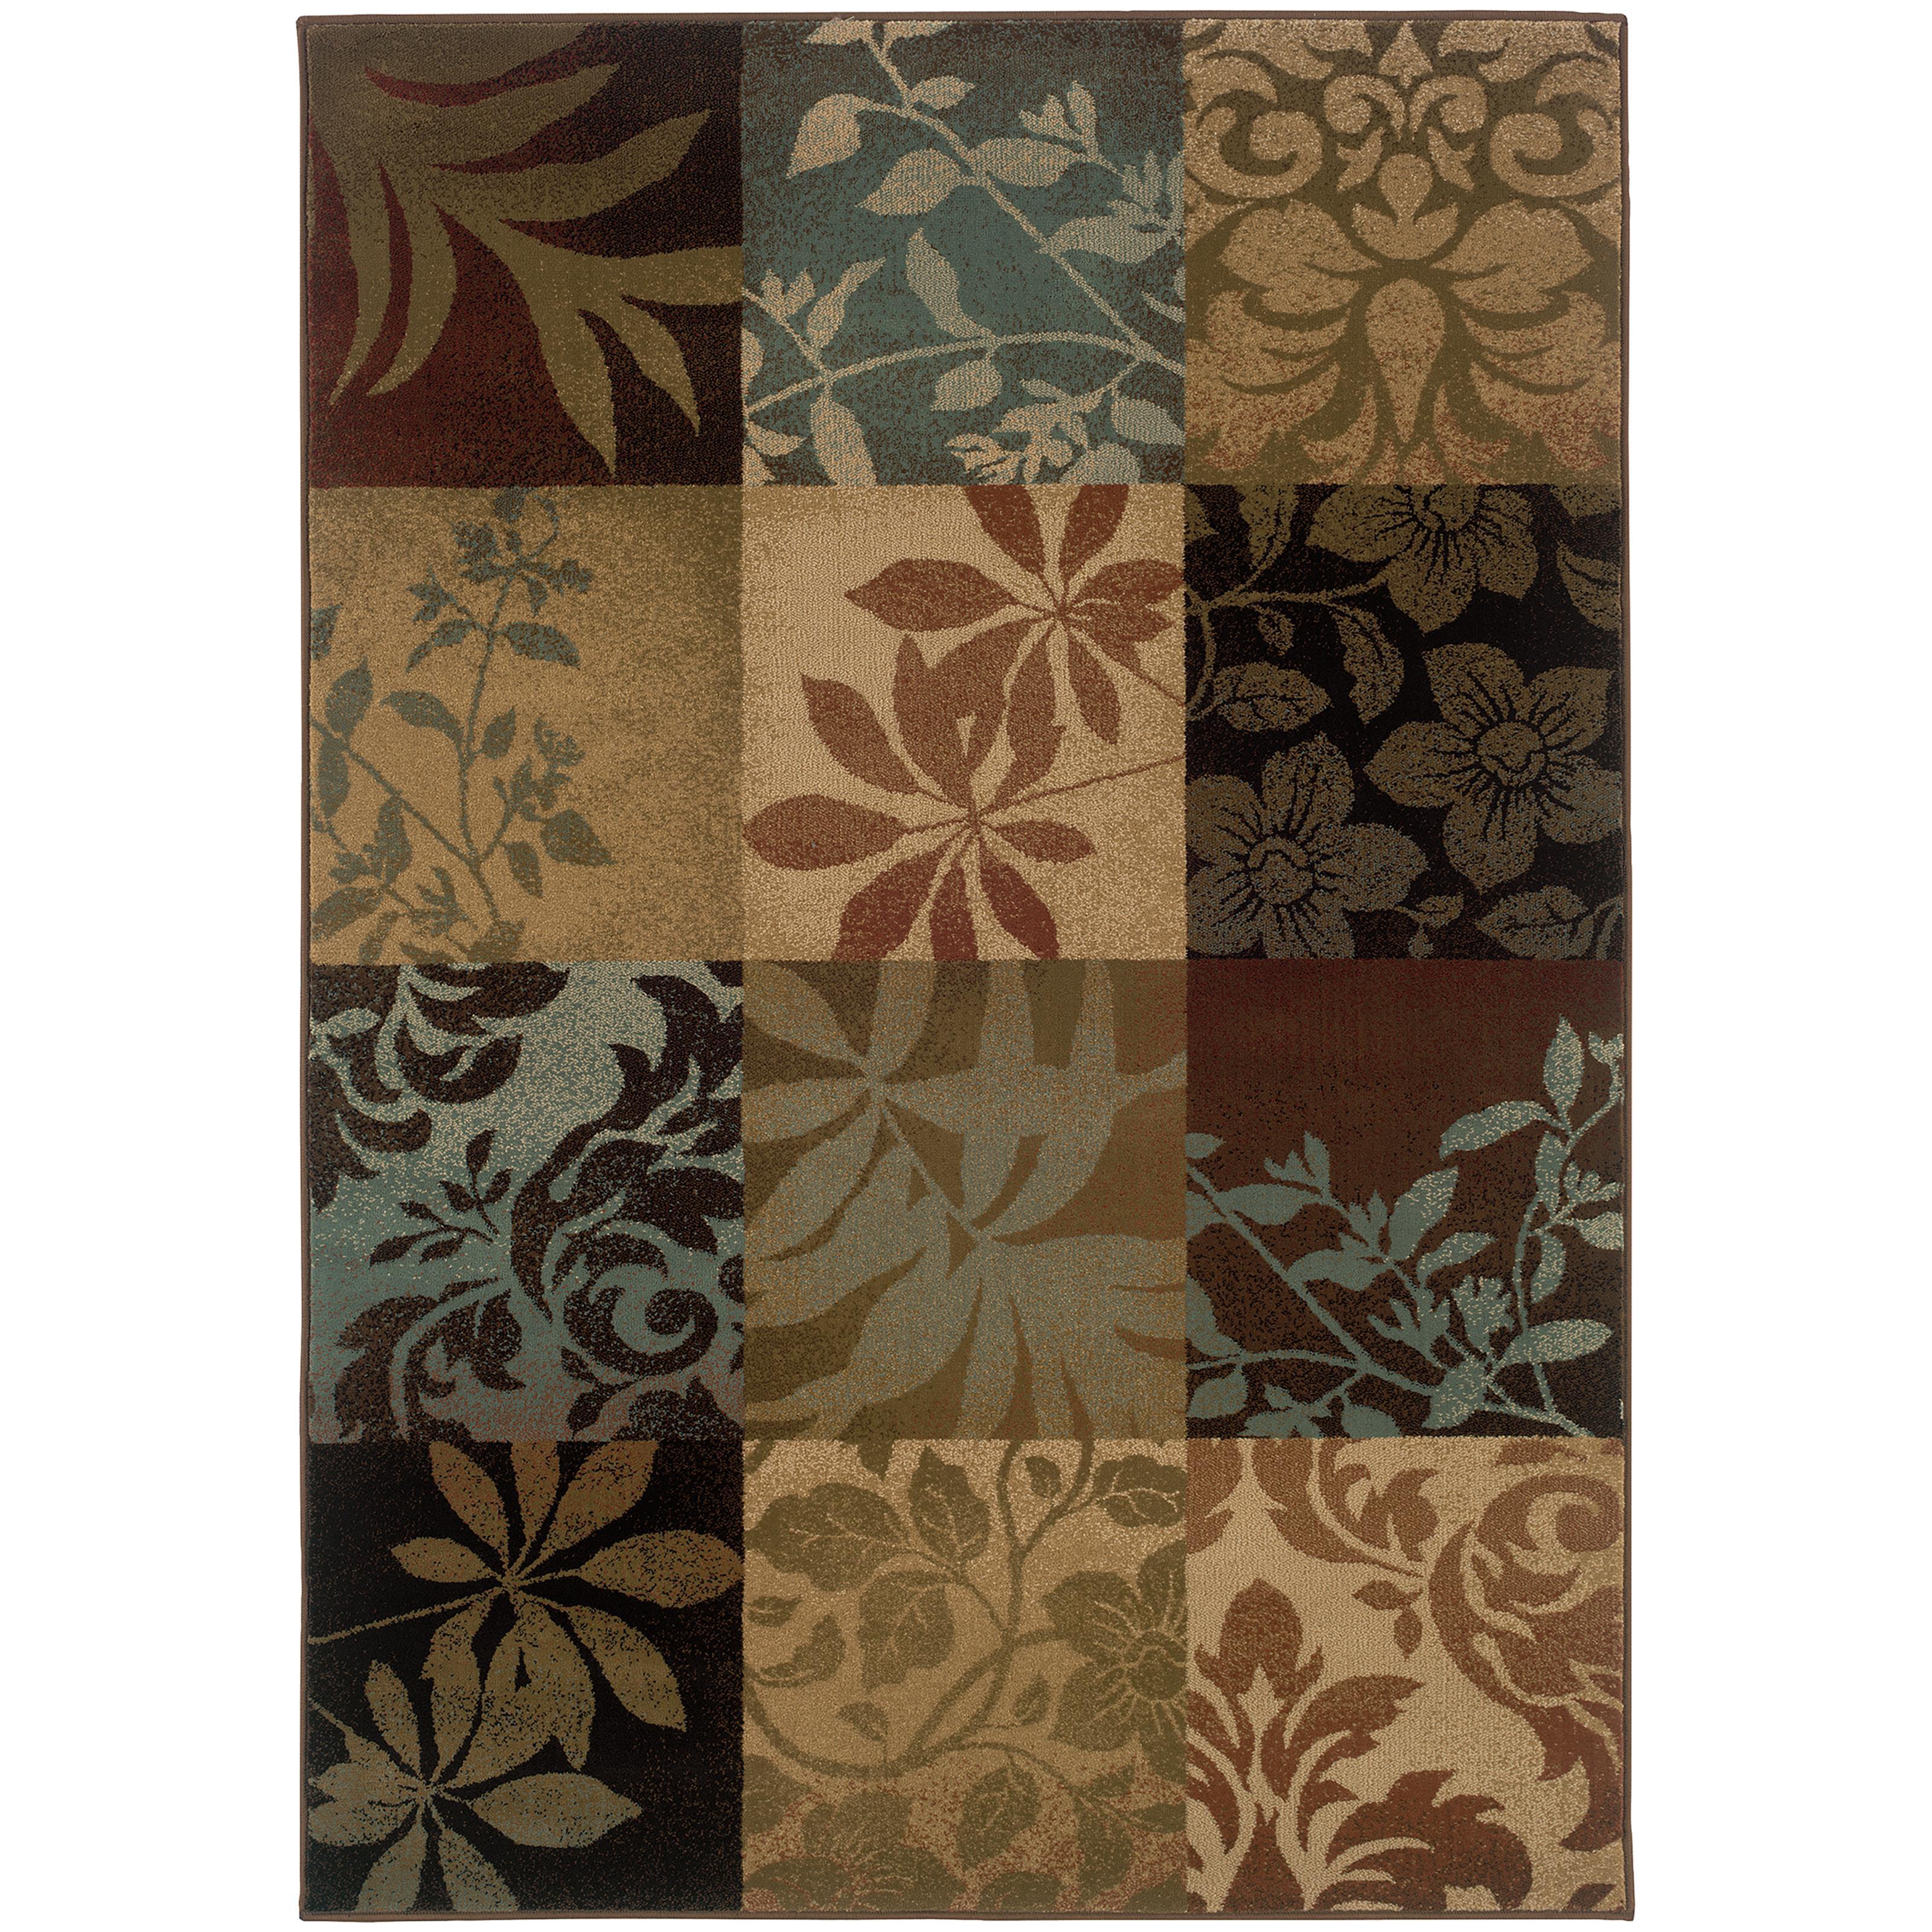 Oriental Weavers Hudson 10' X 13' Rug - Item Number: H058B1306396ST